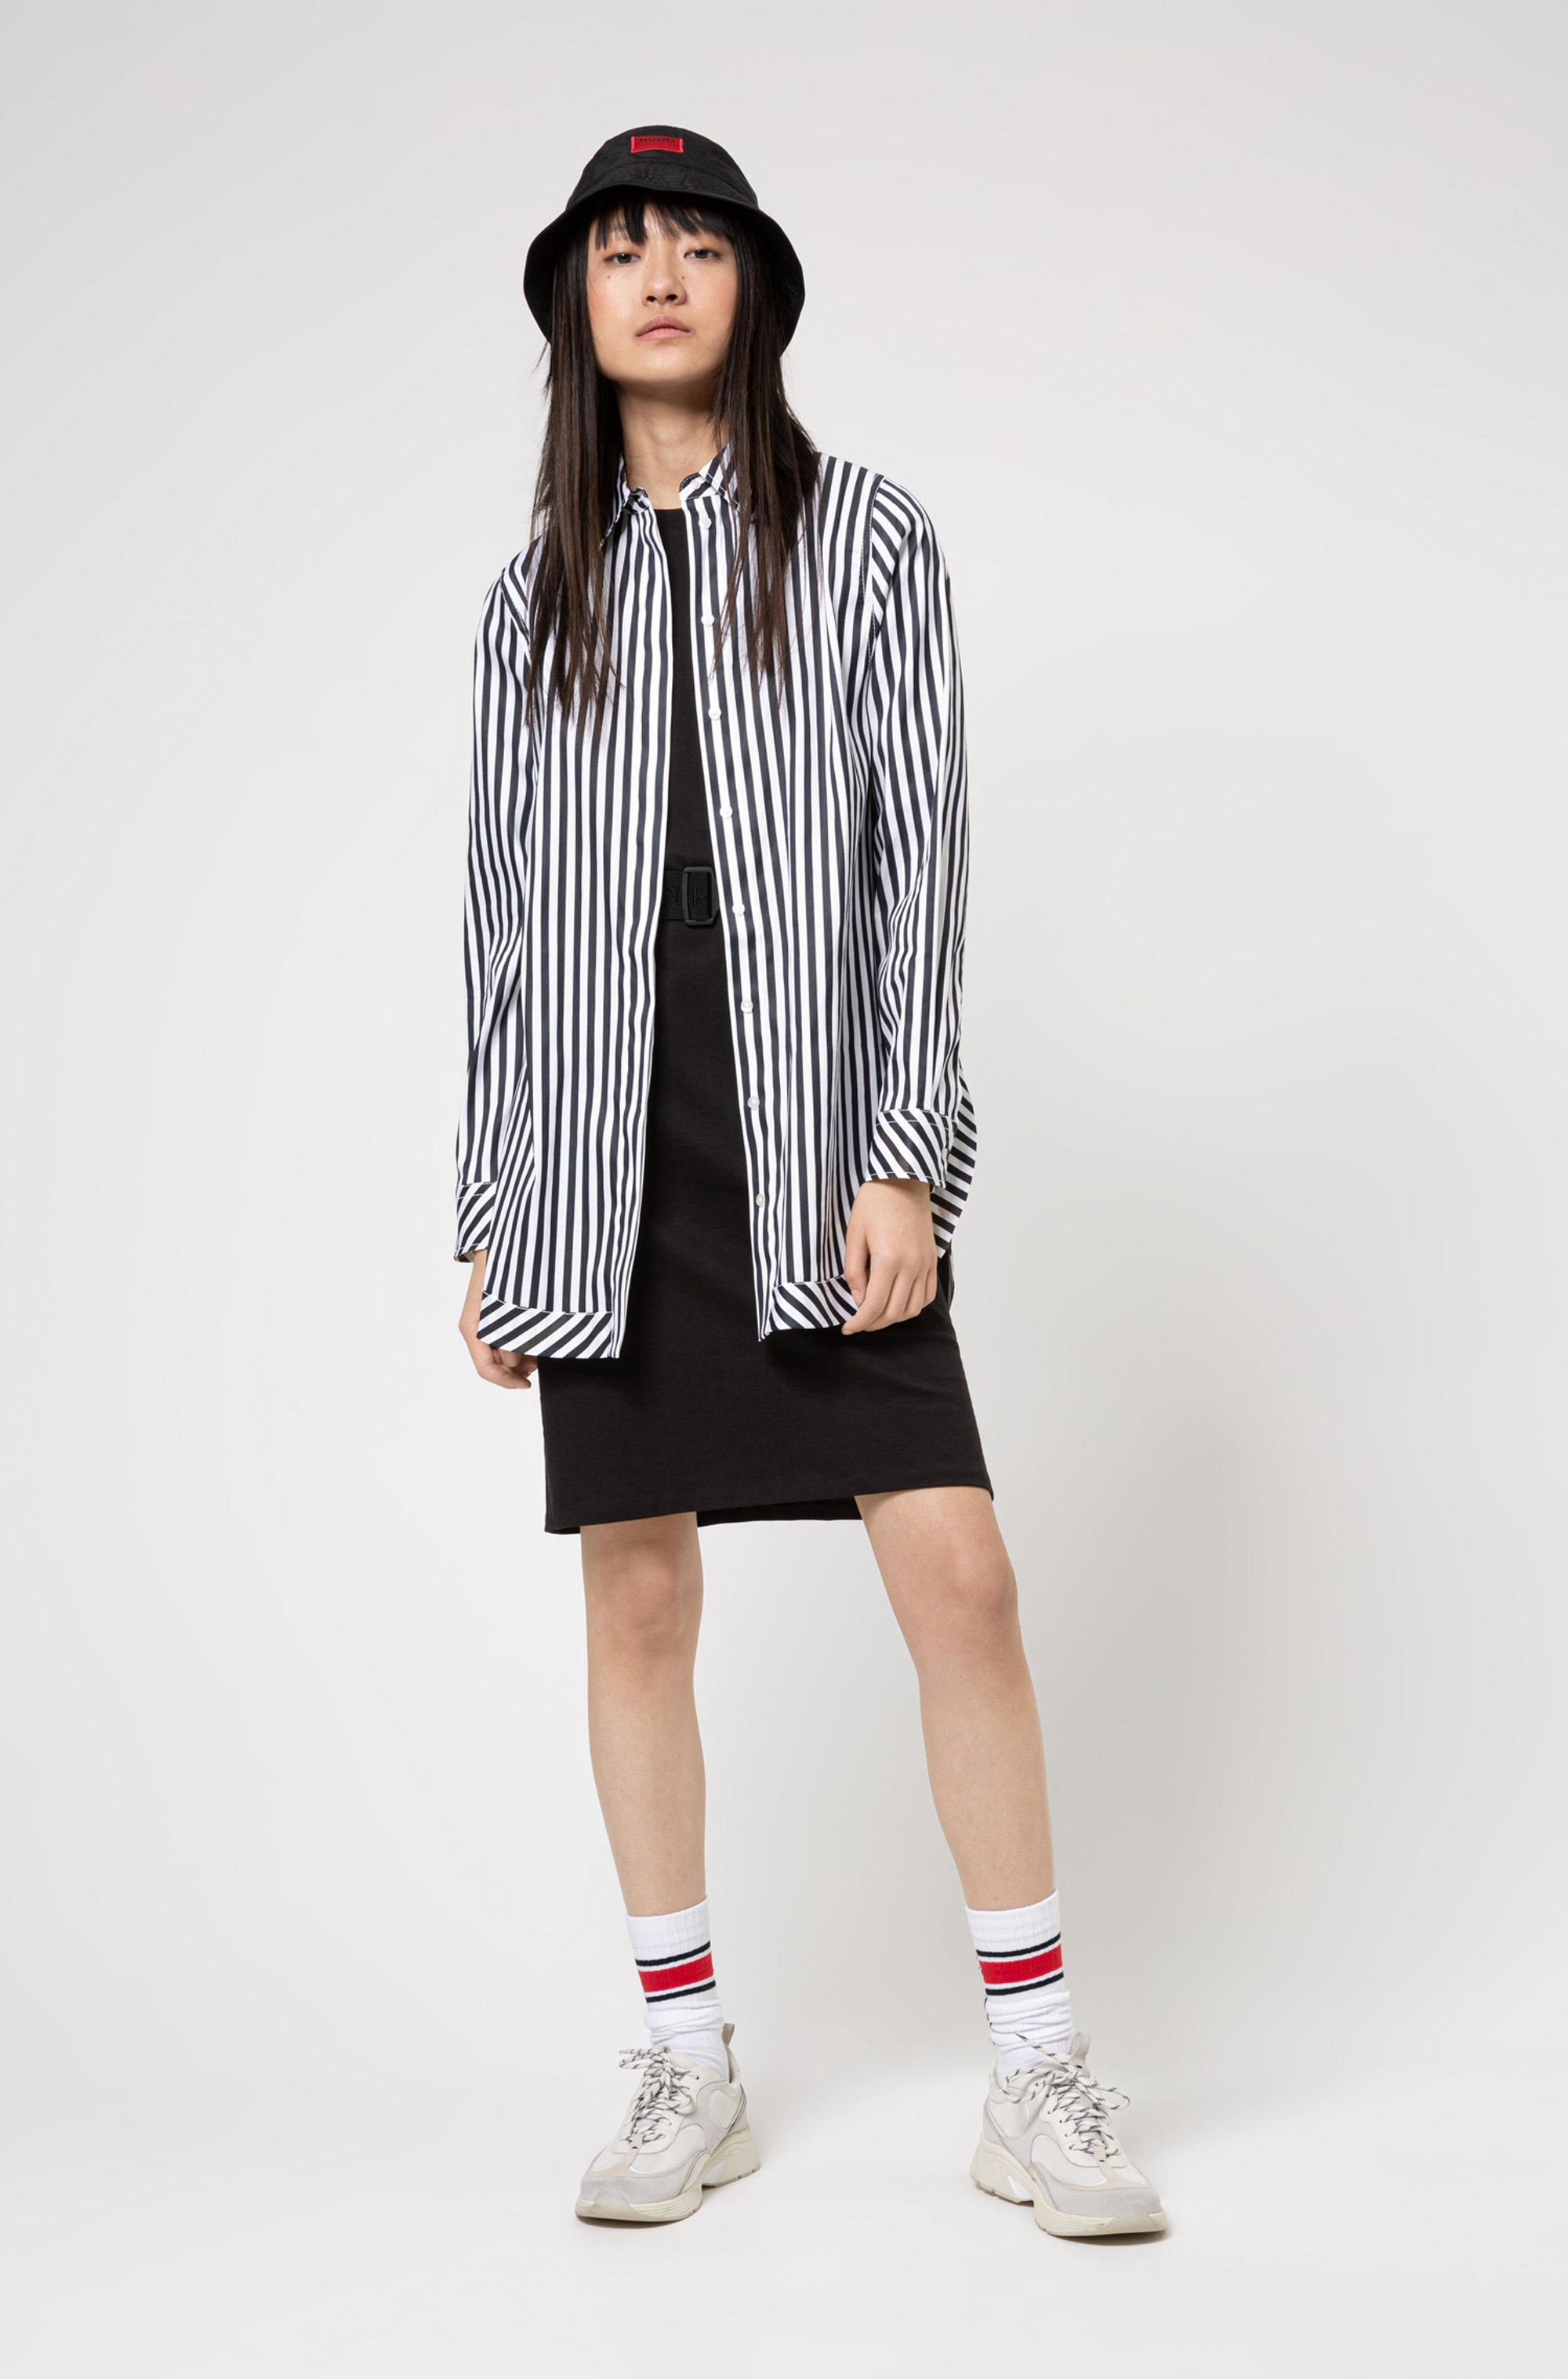 T-shirt dress in organic cotton with logo belt